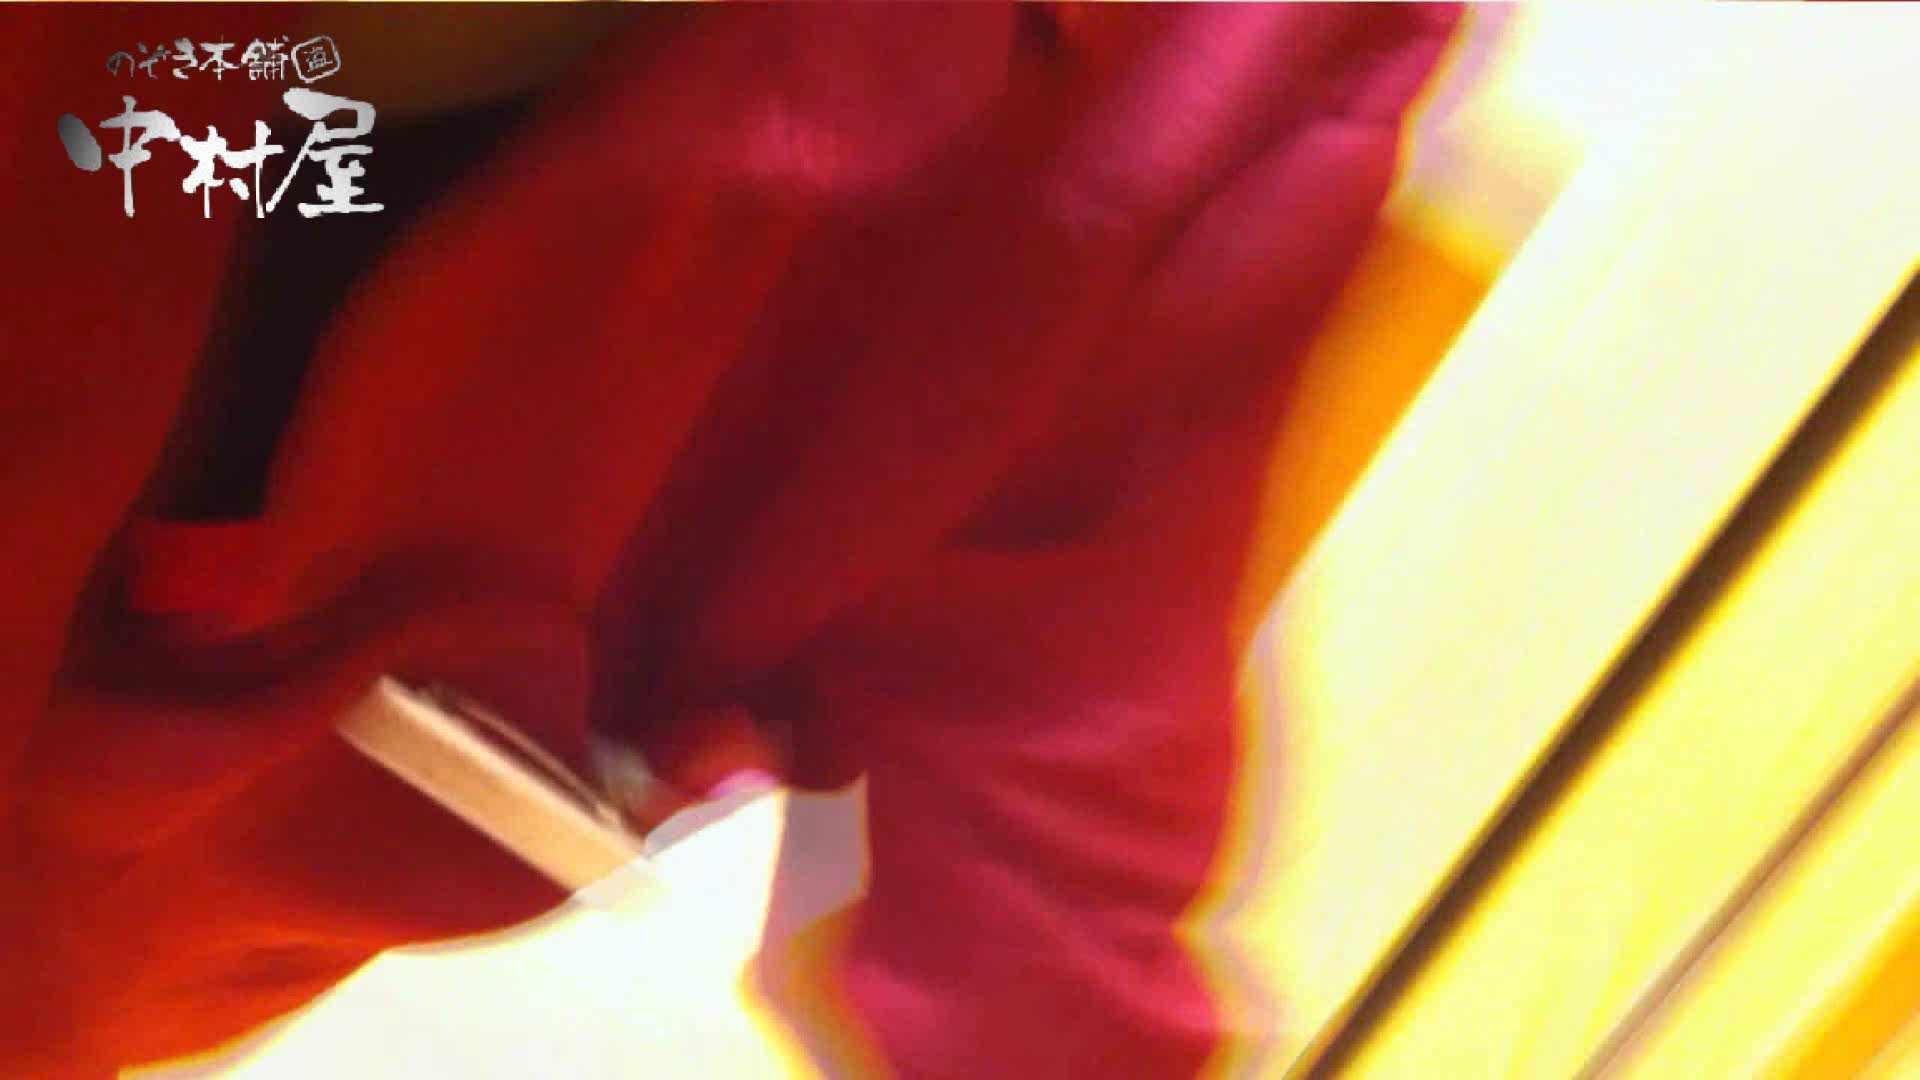 vol.48可愛いカリスマ店員胸チラ&パンチラ アニメ声の店員さん 胸チラ  96Pix 53